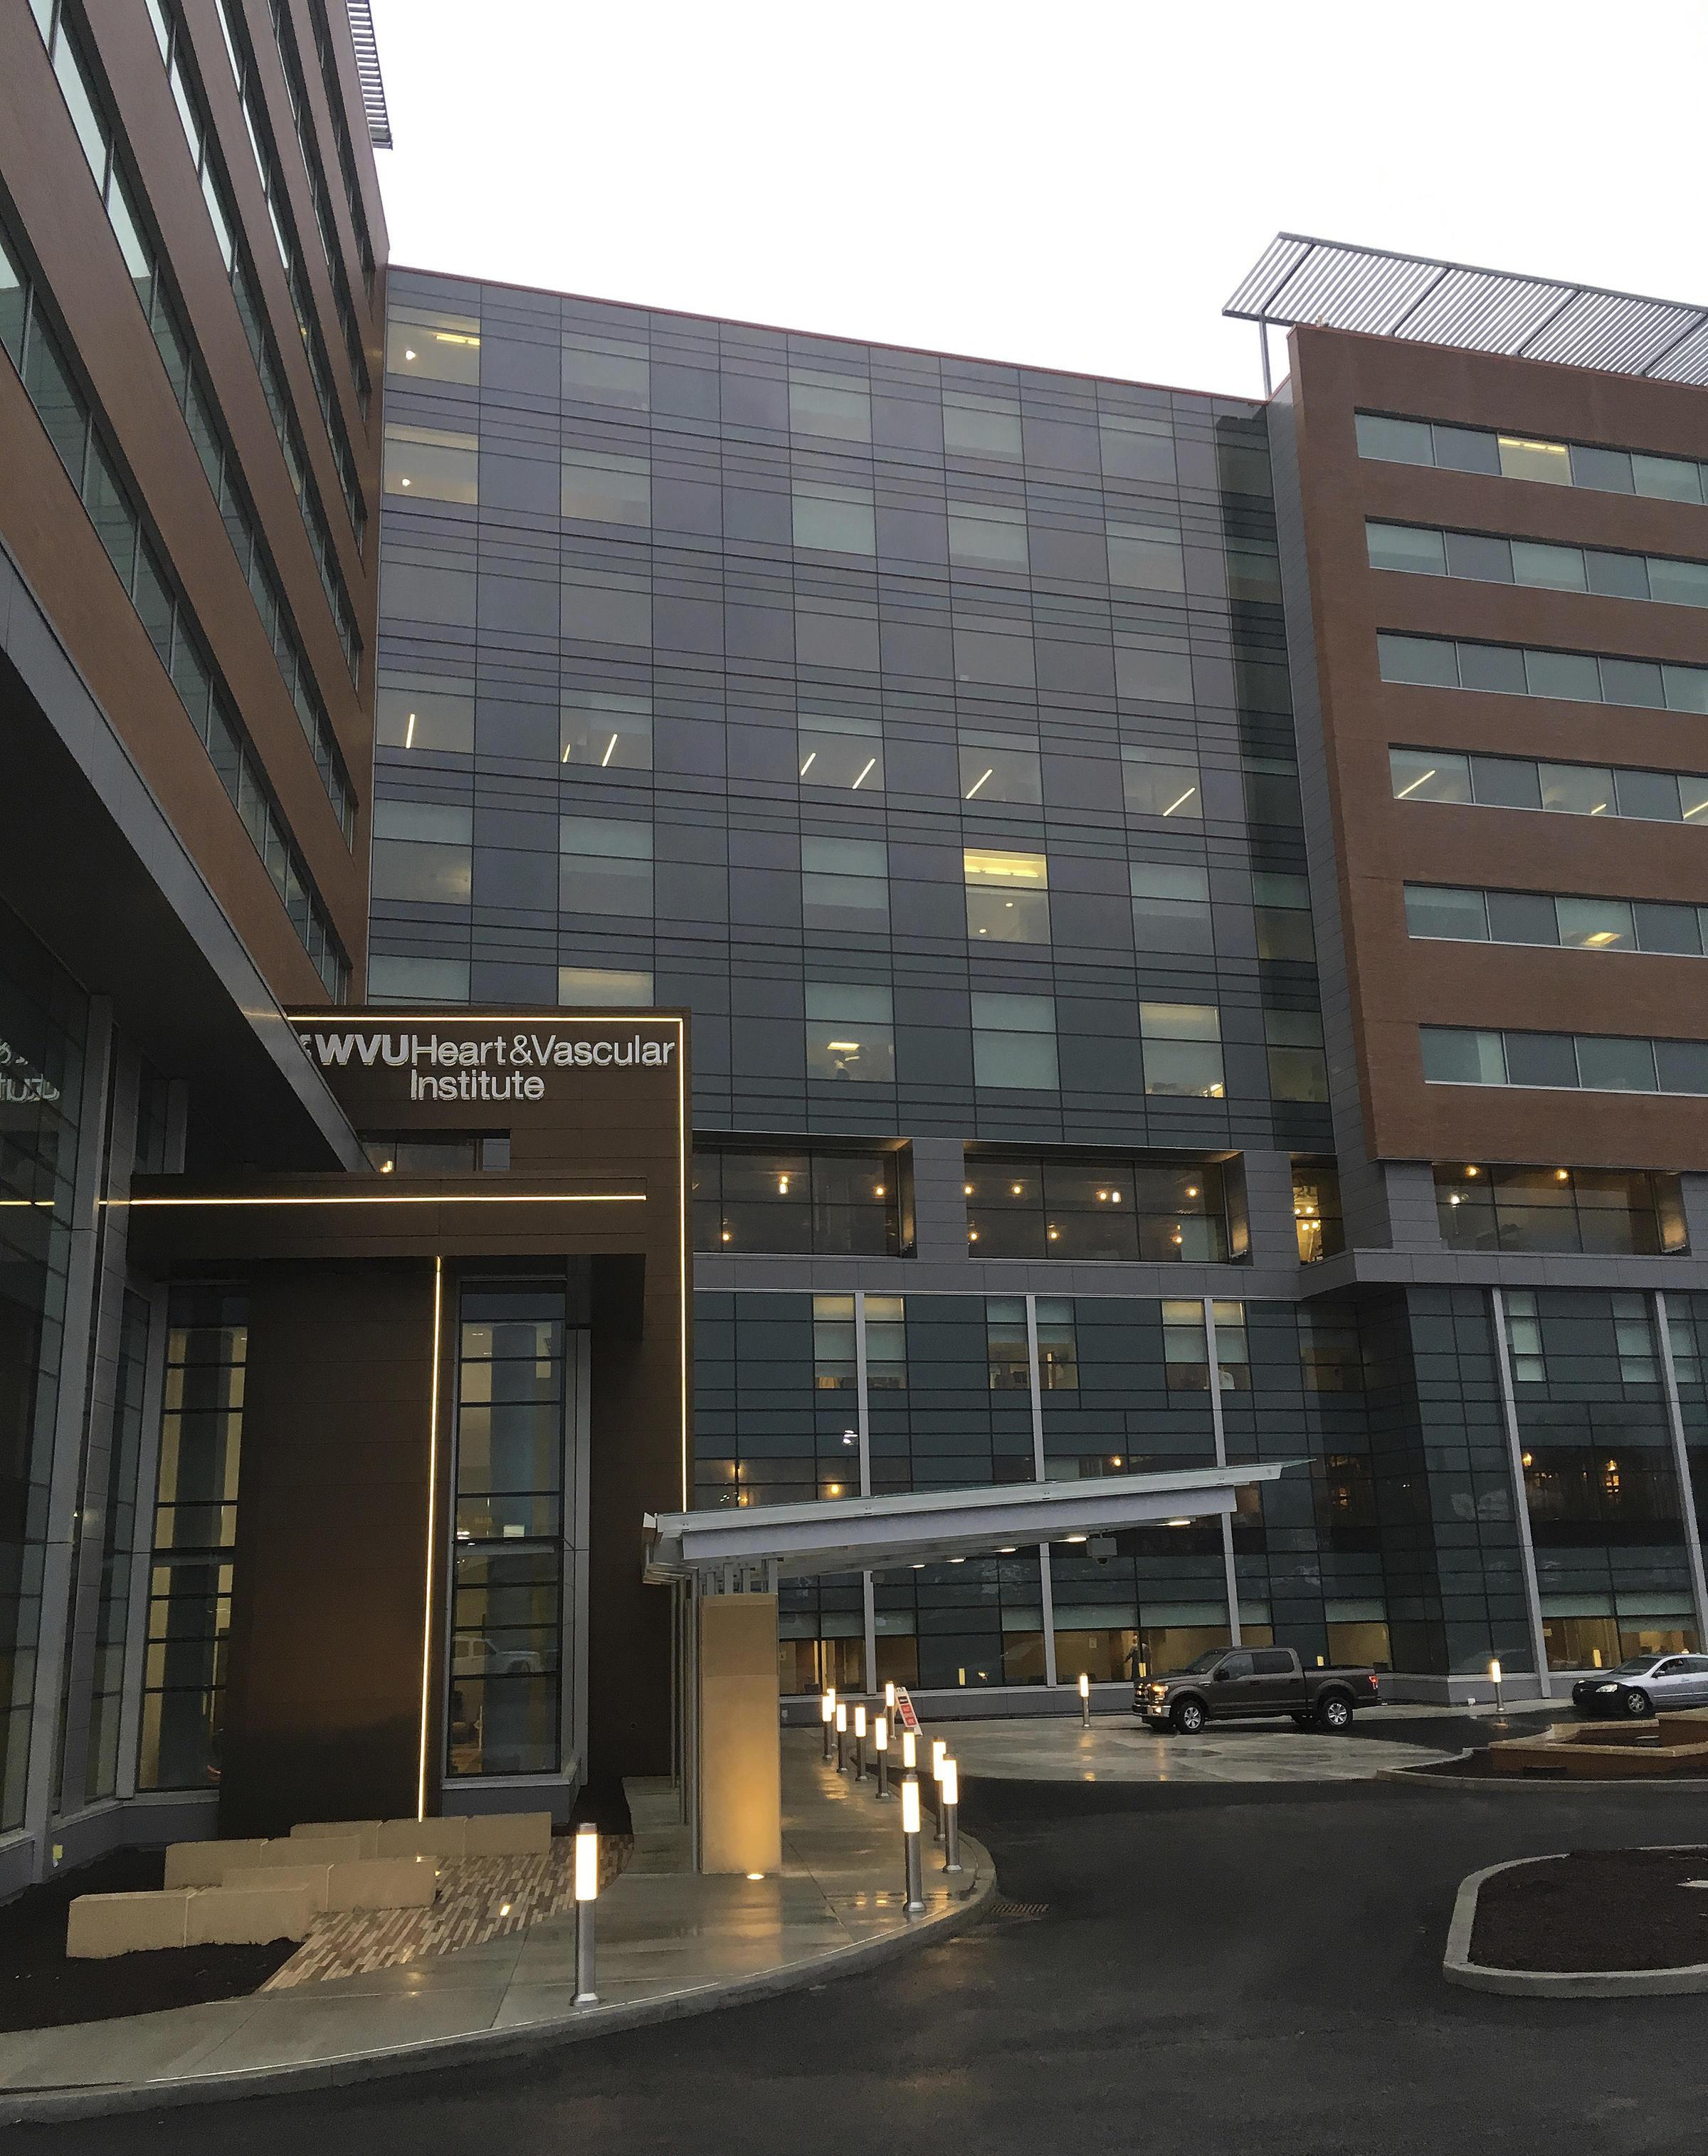 Despite W Va  Economic Woes, WVU Medicine is Booming | West